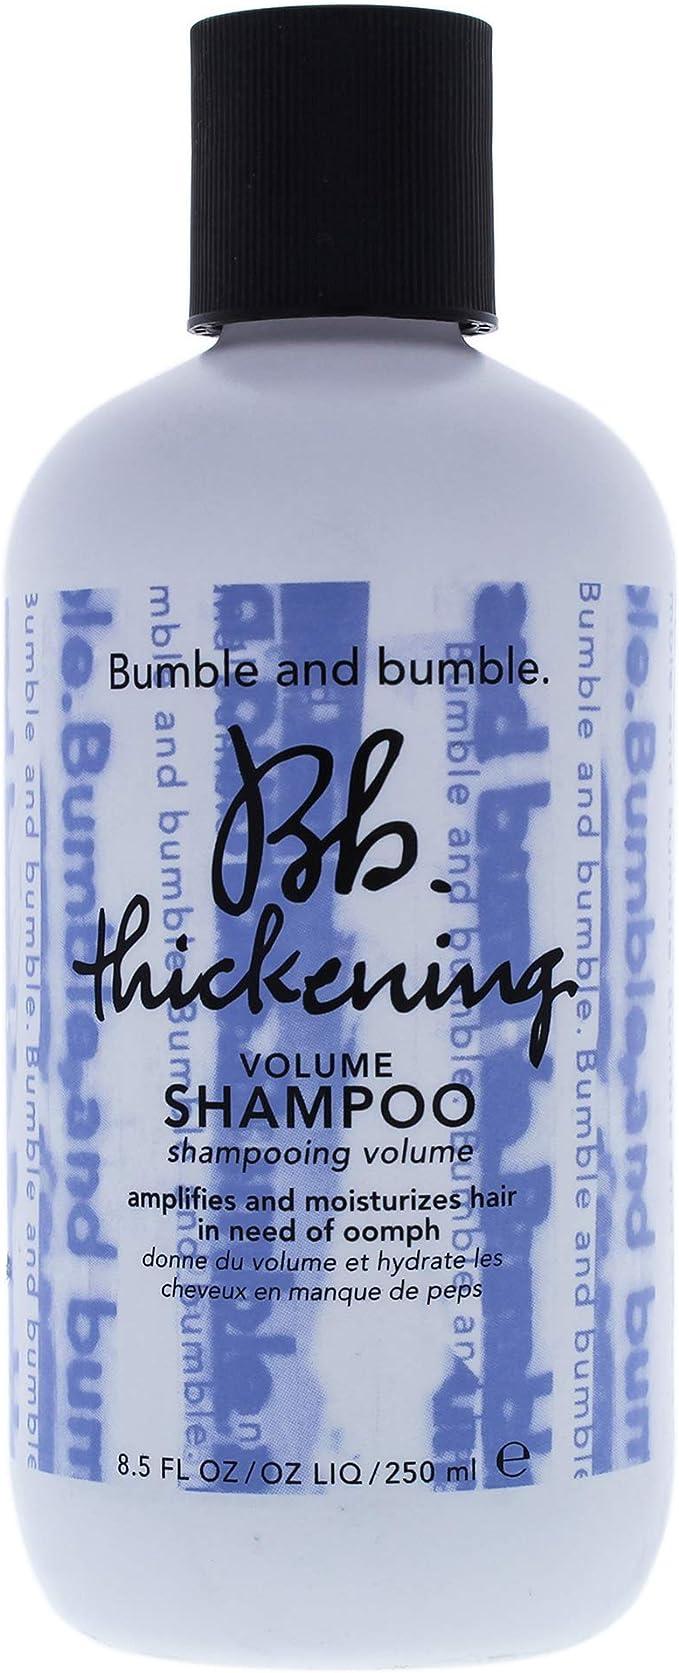 Bumble And Bumble Thickening Shampoo 250ml 8 Fl Oz Amazon Co Uk Beauty